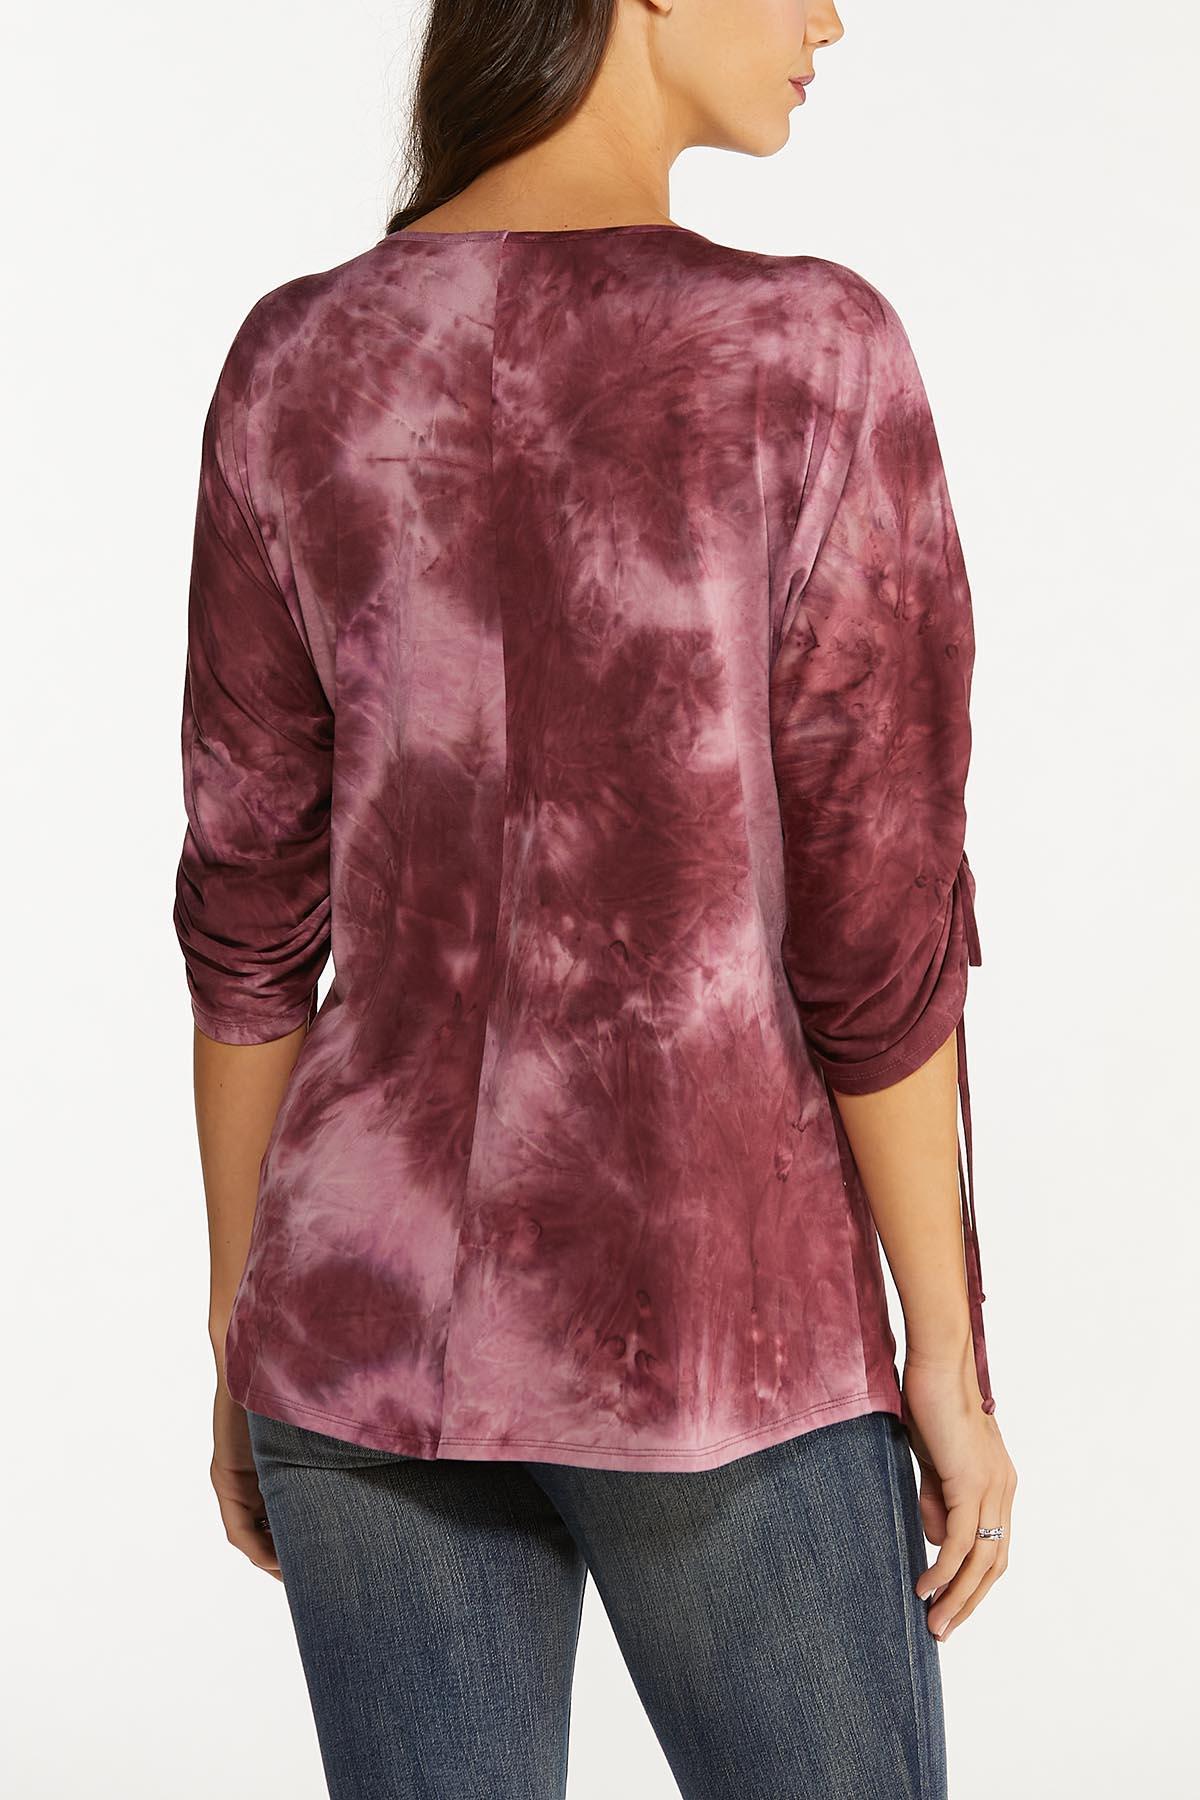 Plus Size Wine Tie Dye Top (Item #44739452)